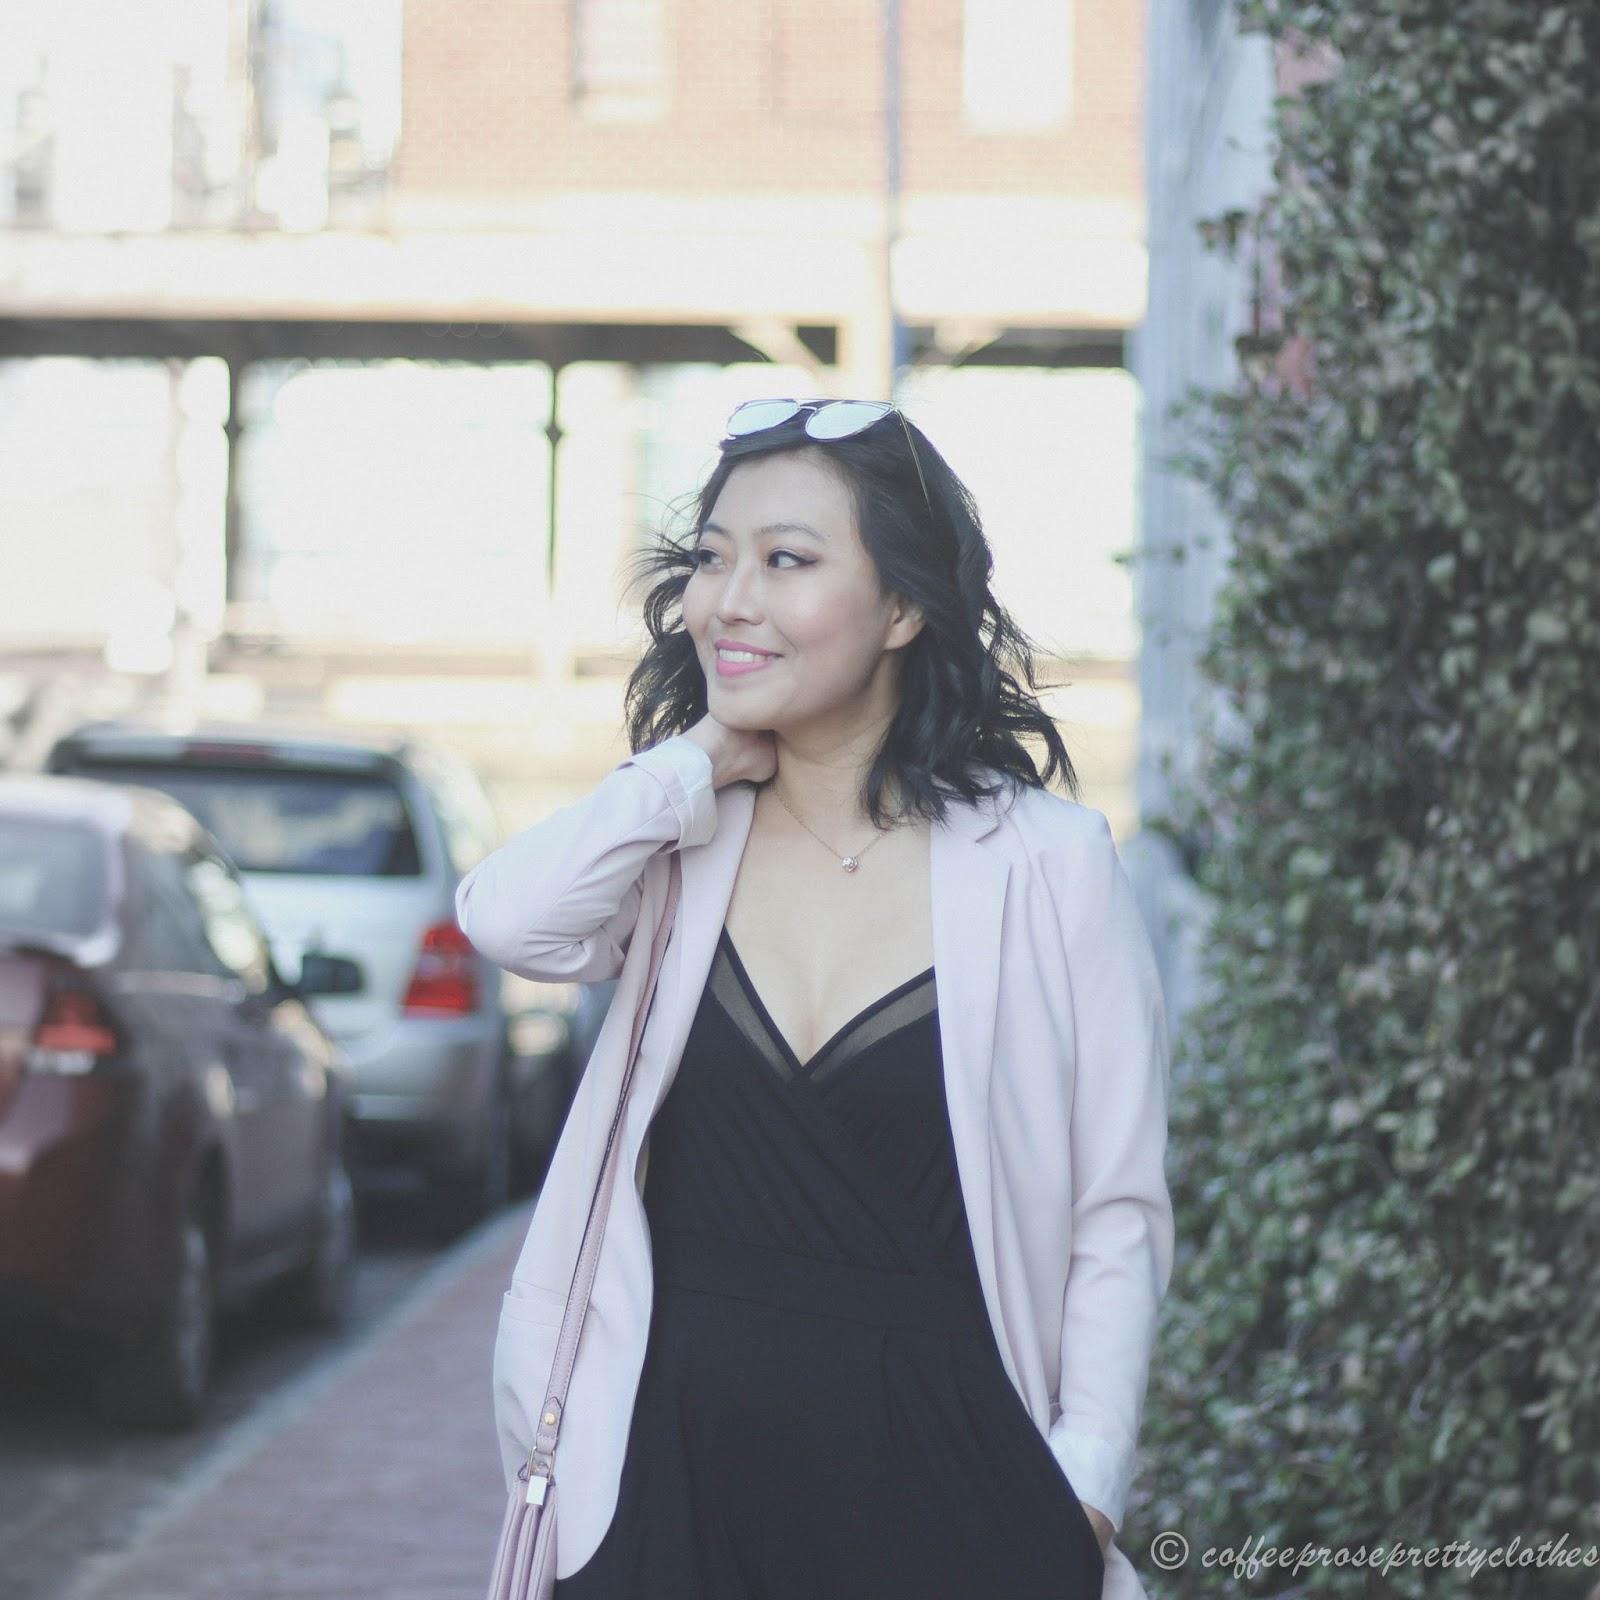 ASOS black jumpsuit, Kate Spade Madelyne, blush blazer H&M, Zara heelsASOS black jumpsuit, Kate Spade Madelyne, blush blazer H&M, Zara heels